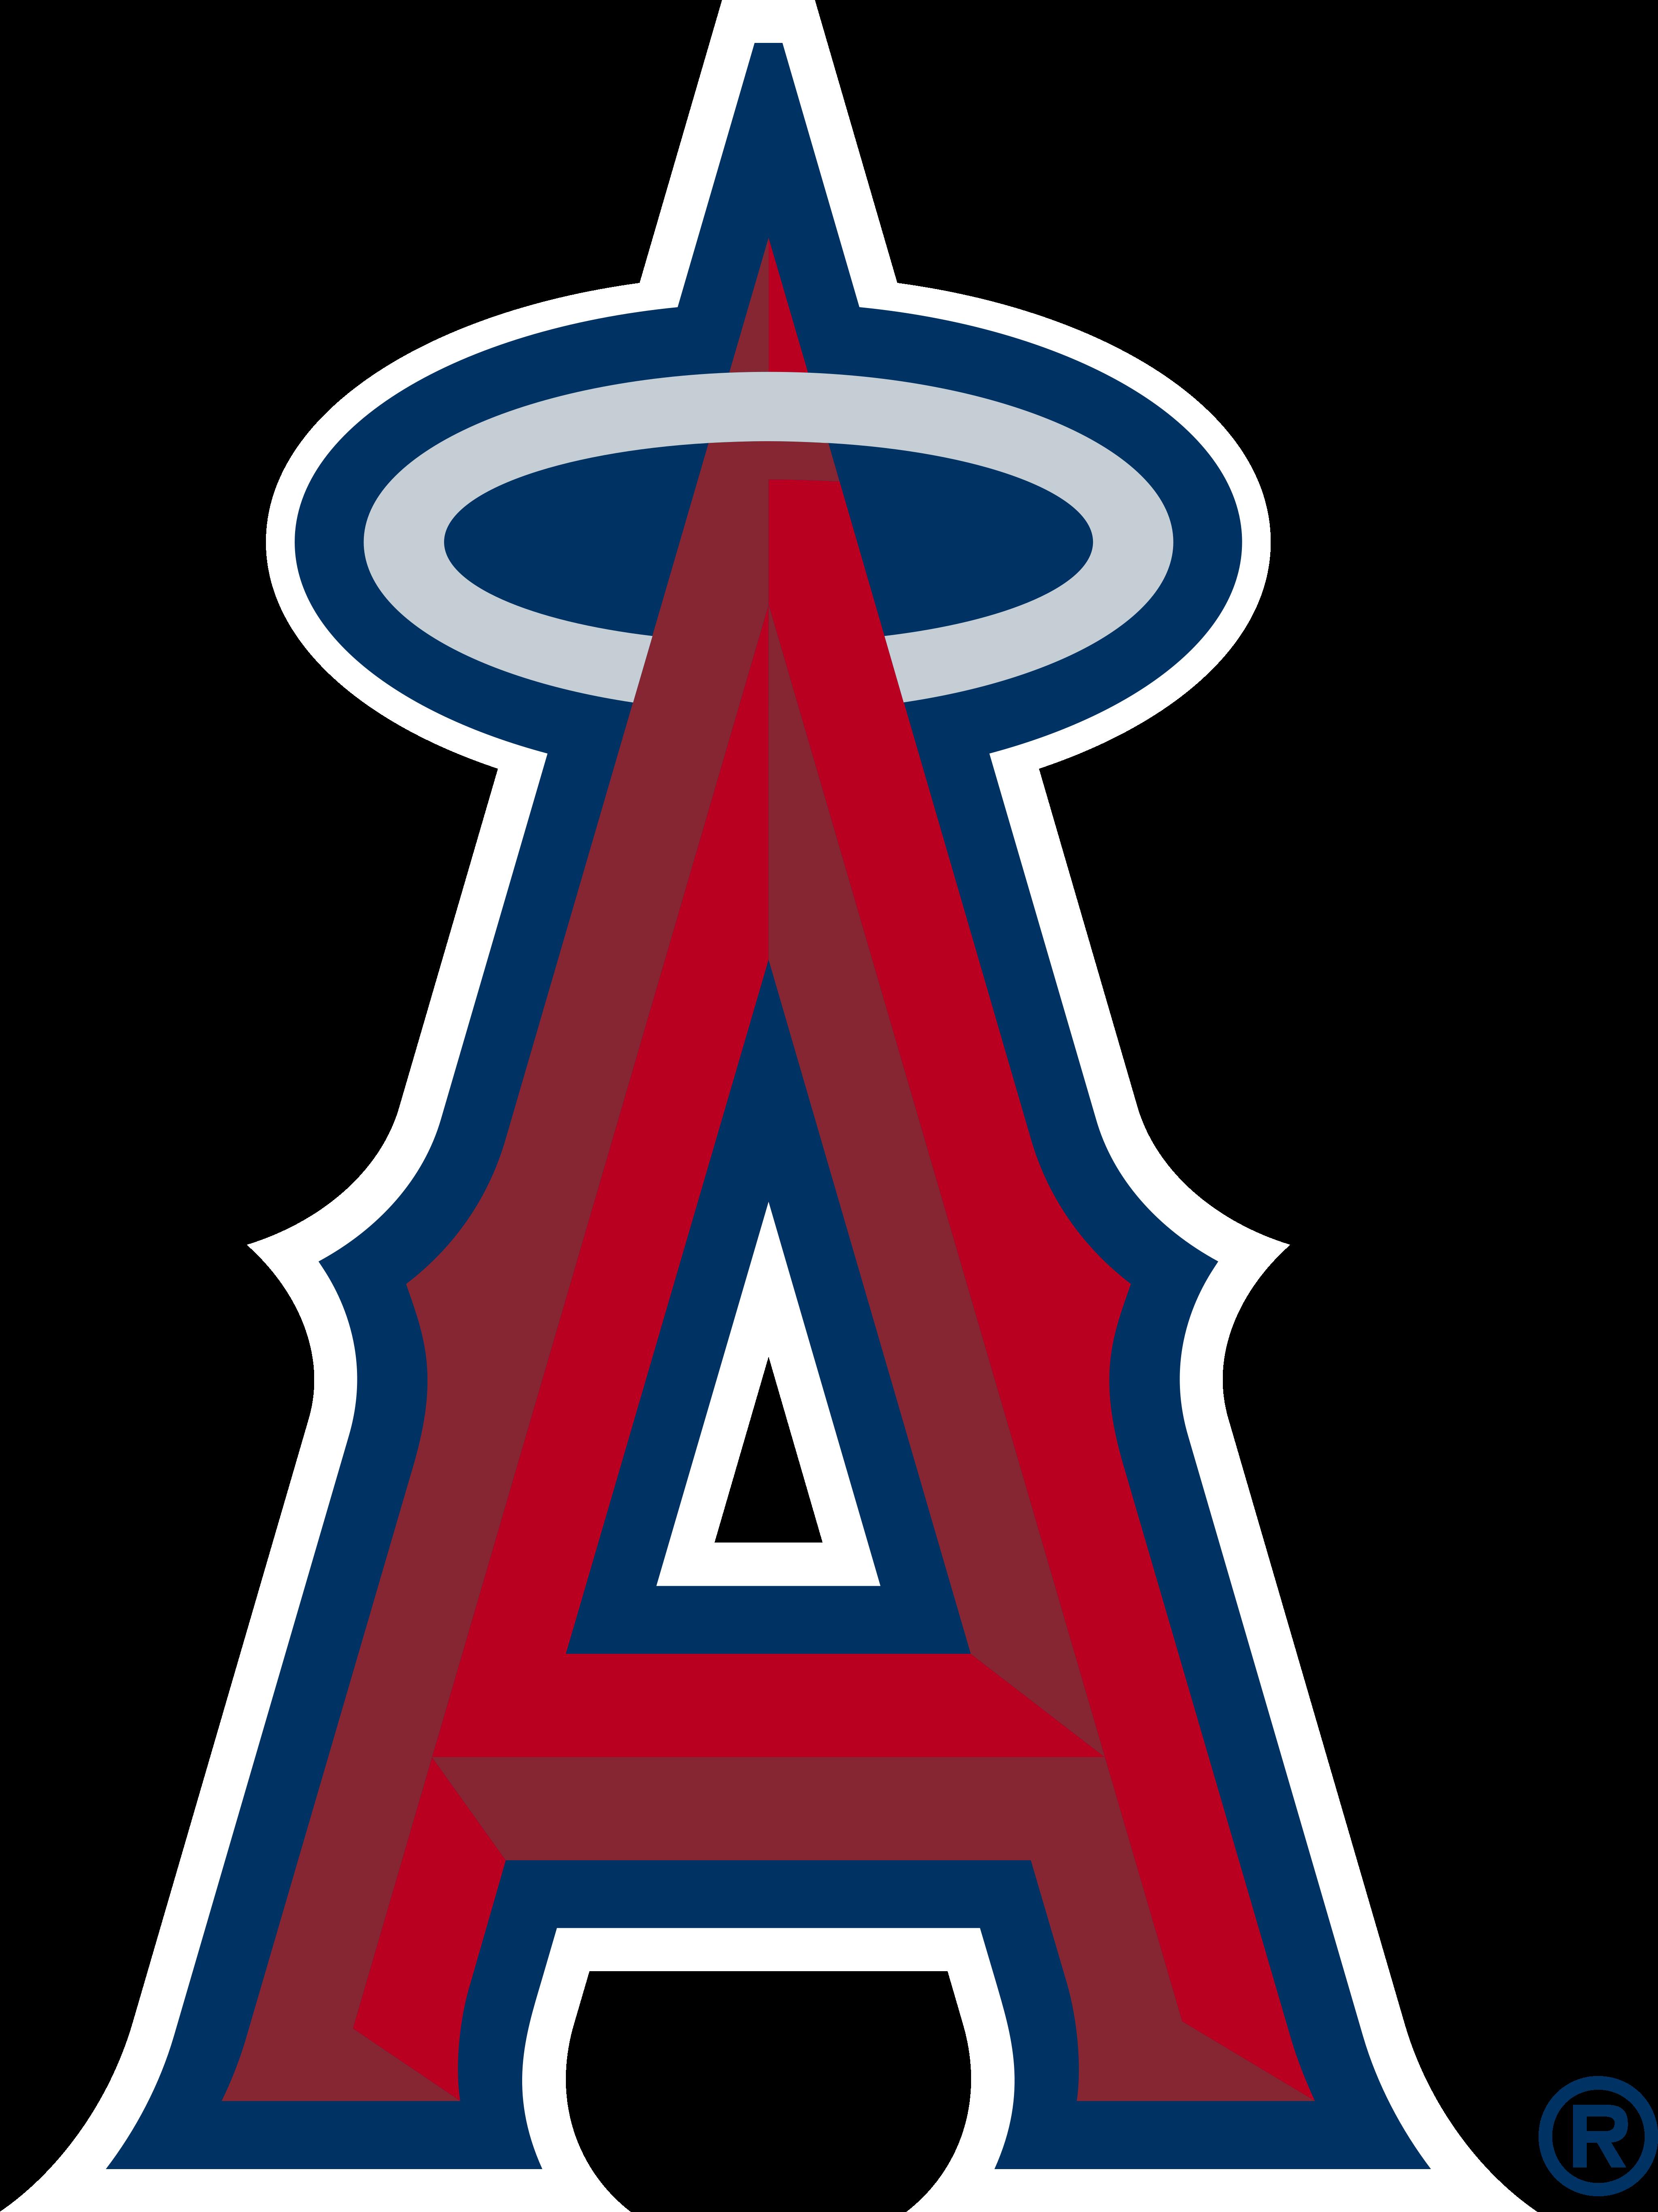 los angeles angels logo - Los Angeles Angels Logo